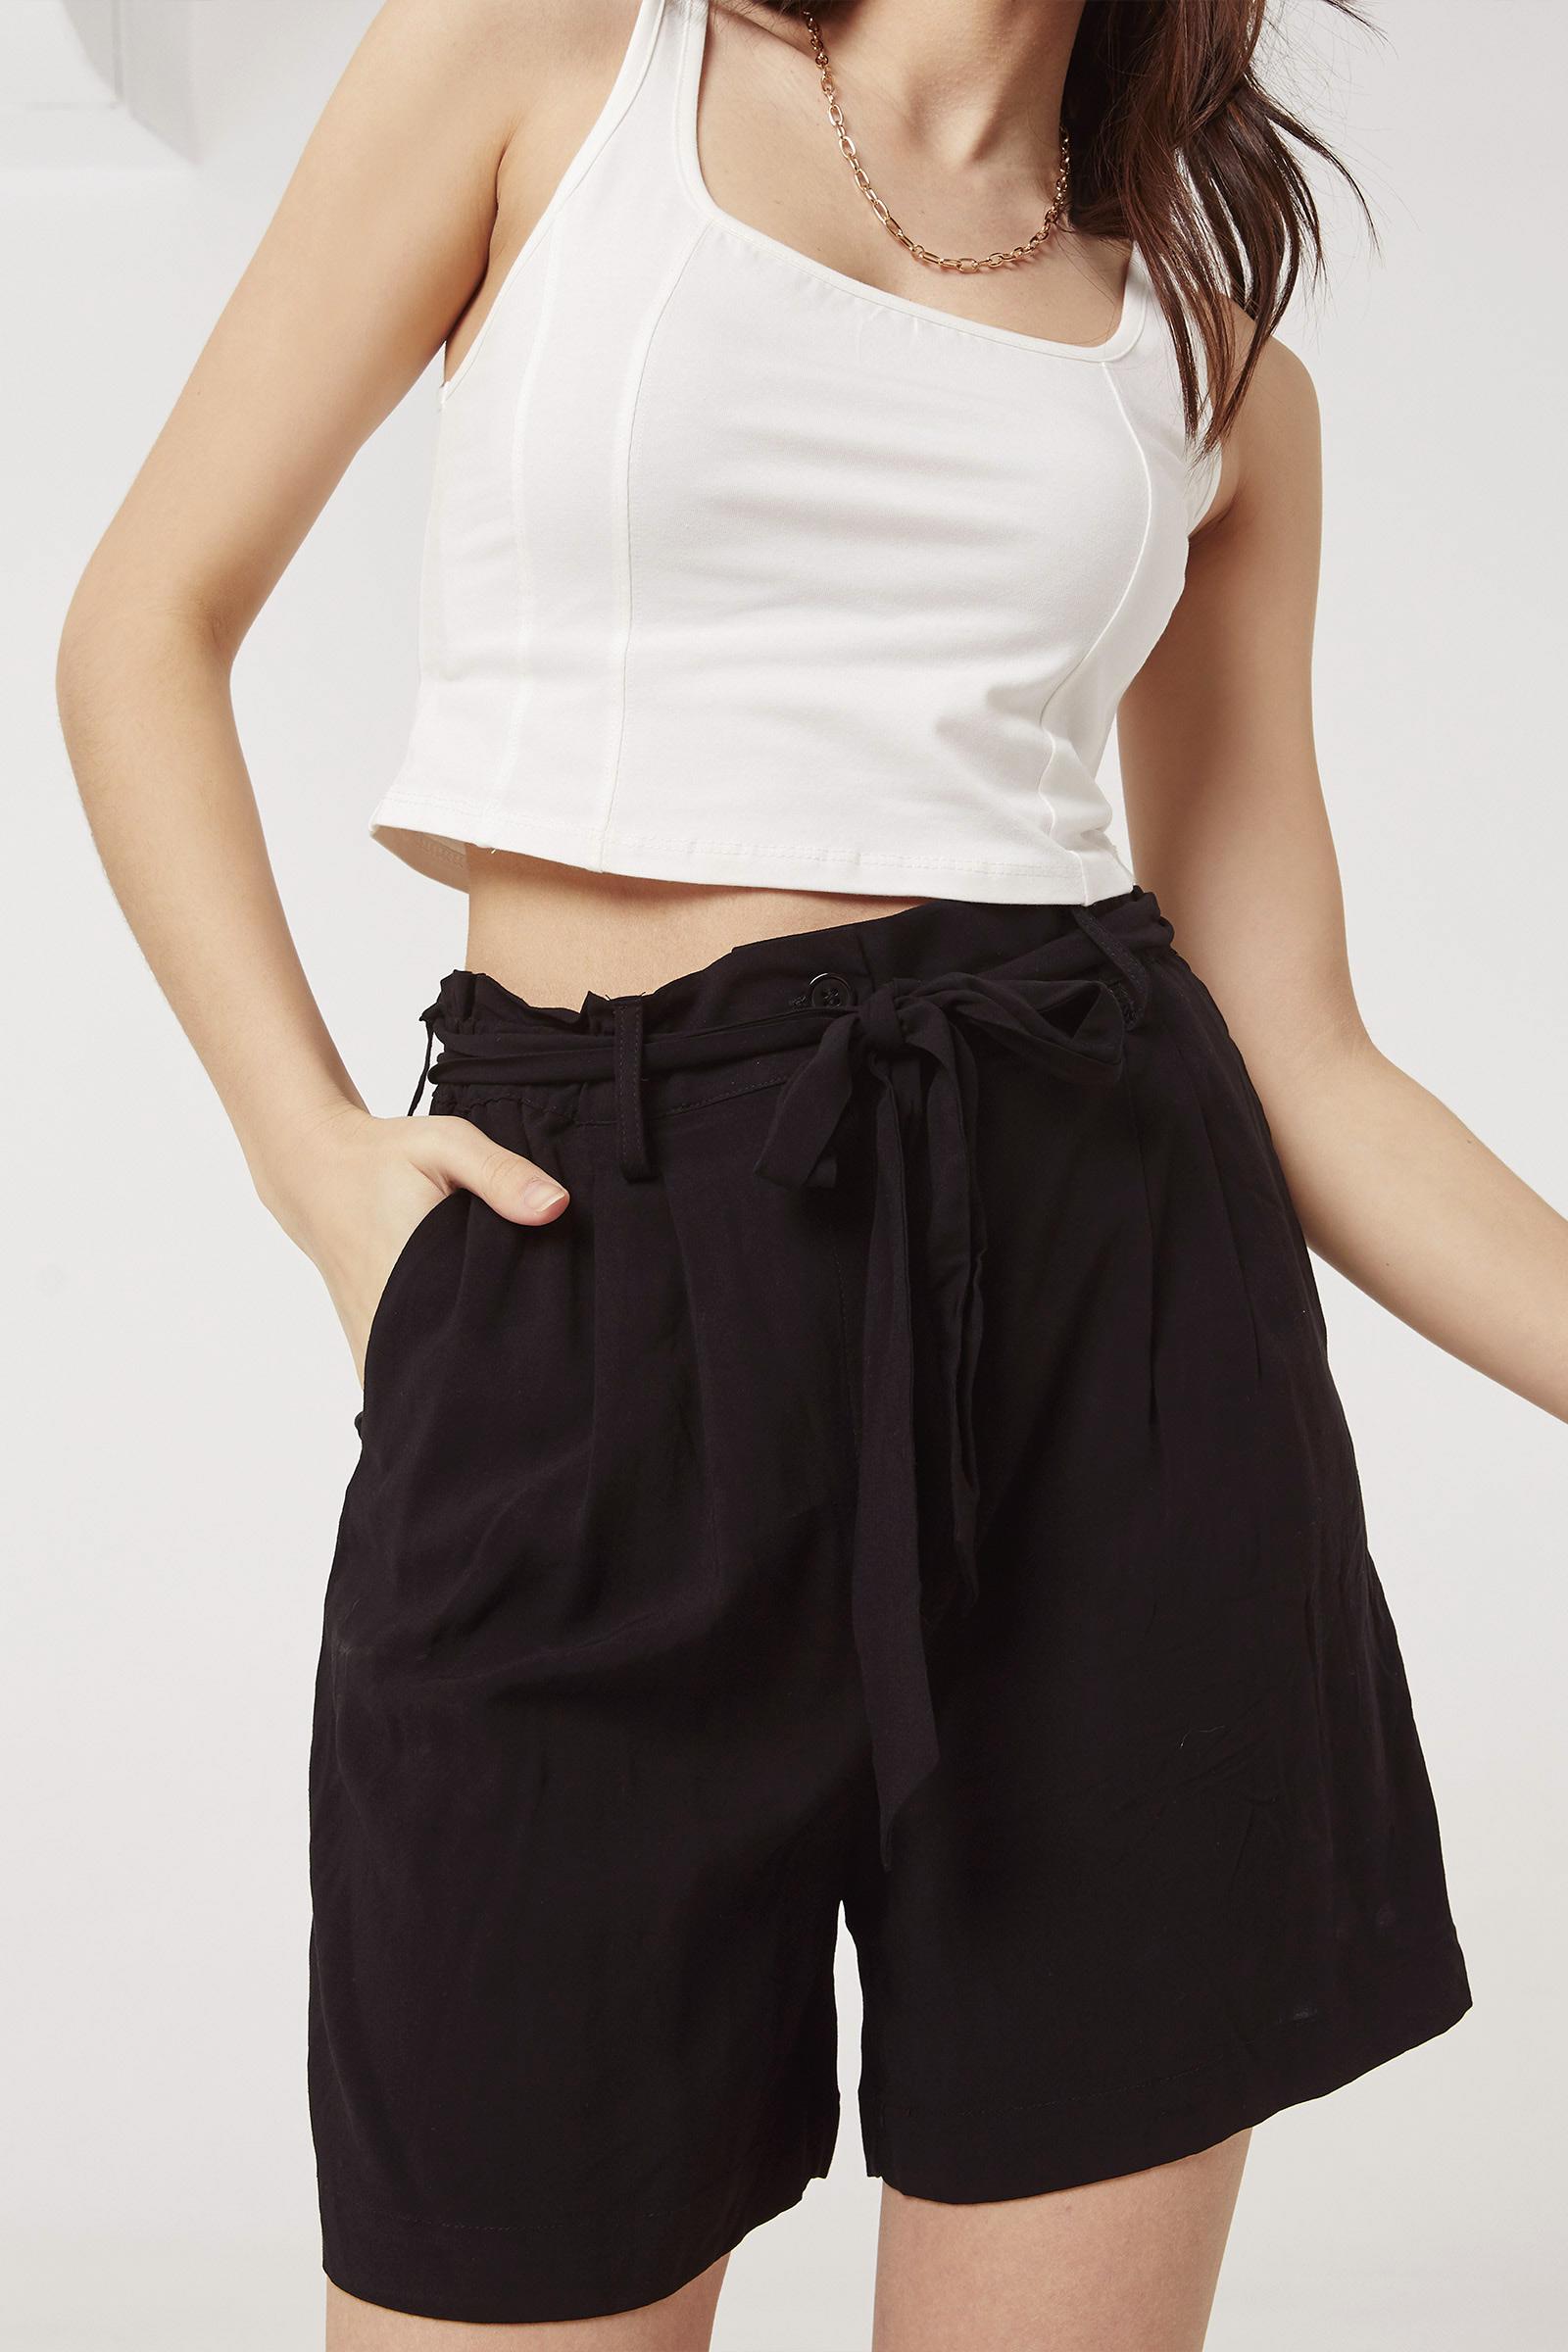 A.C.W. Ultra High Rise Paper Bag Shorts